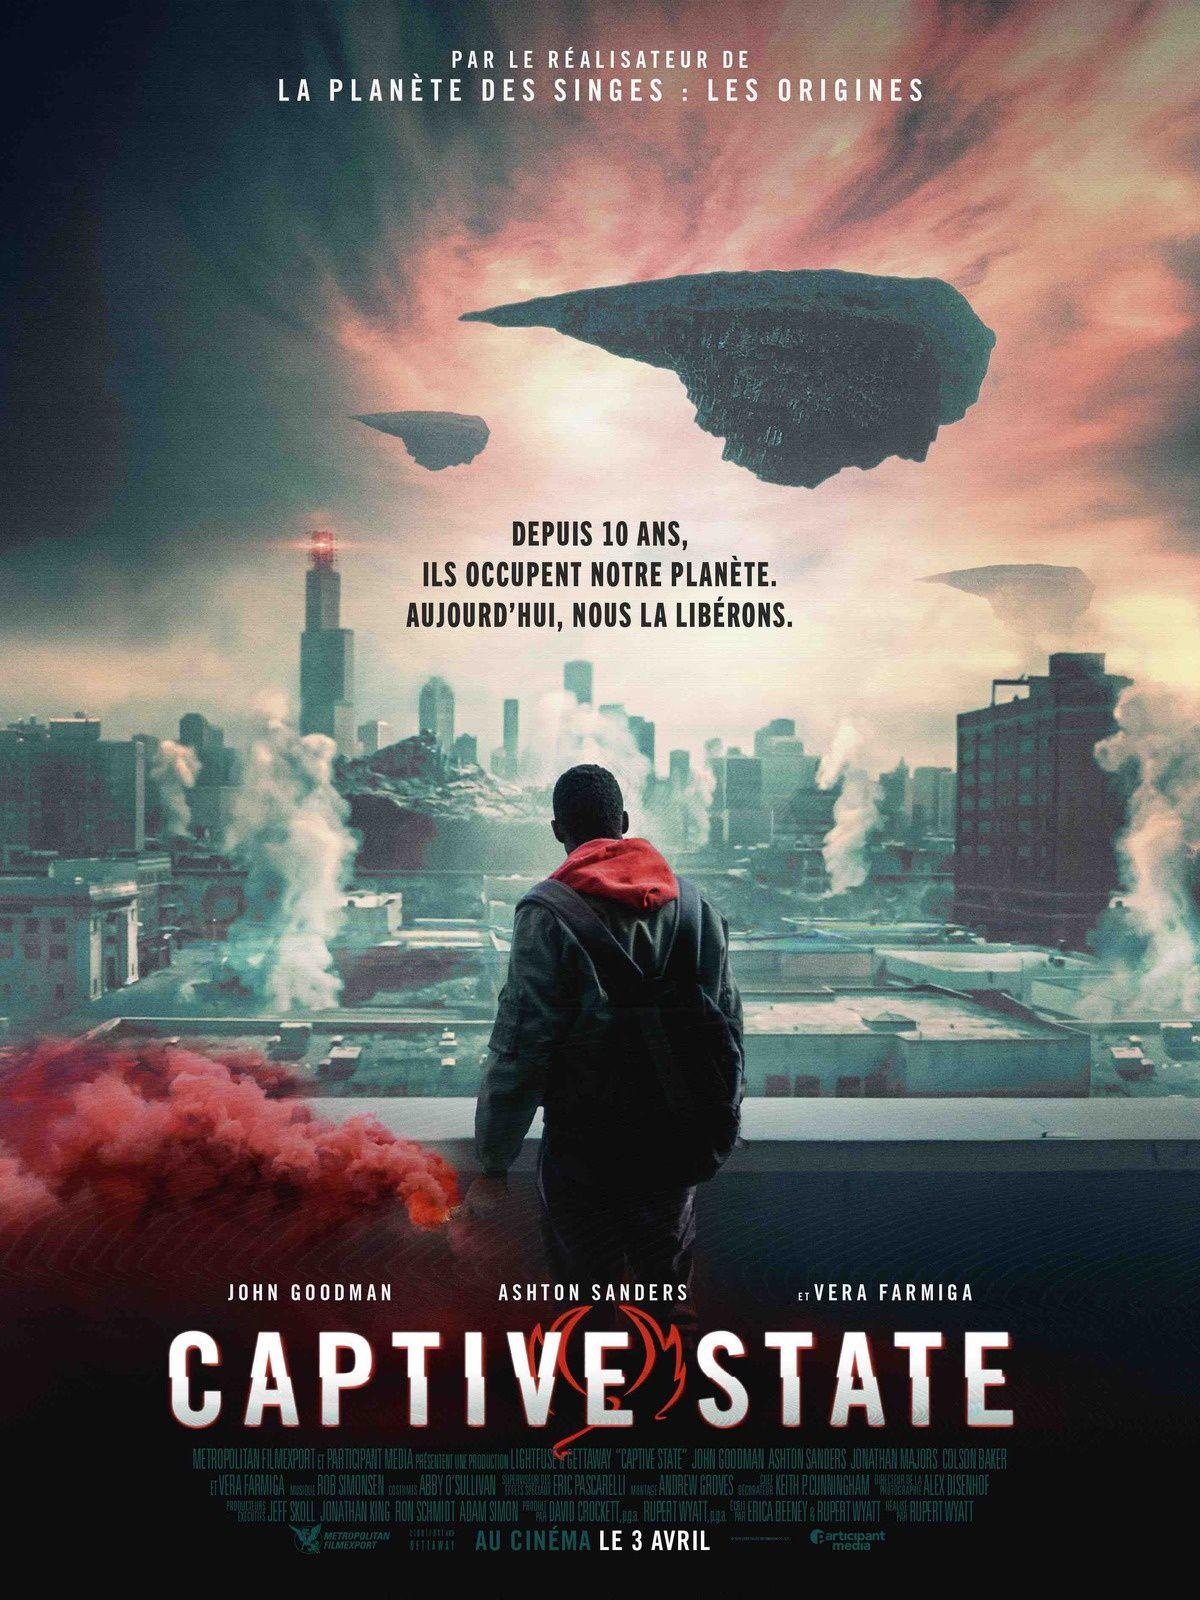 Captive State (BANDE-ANNONCE) avec John Goodman, Vera Farmiga - Le 3 avril 2019 au cinéma